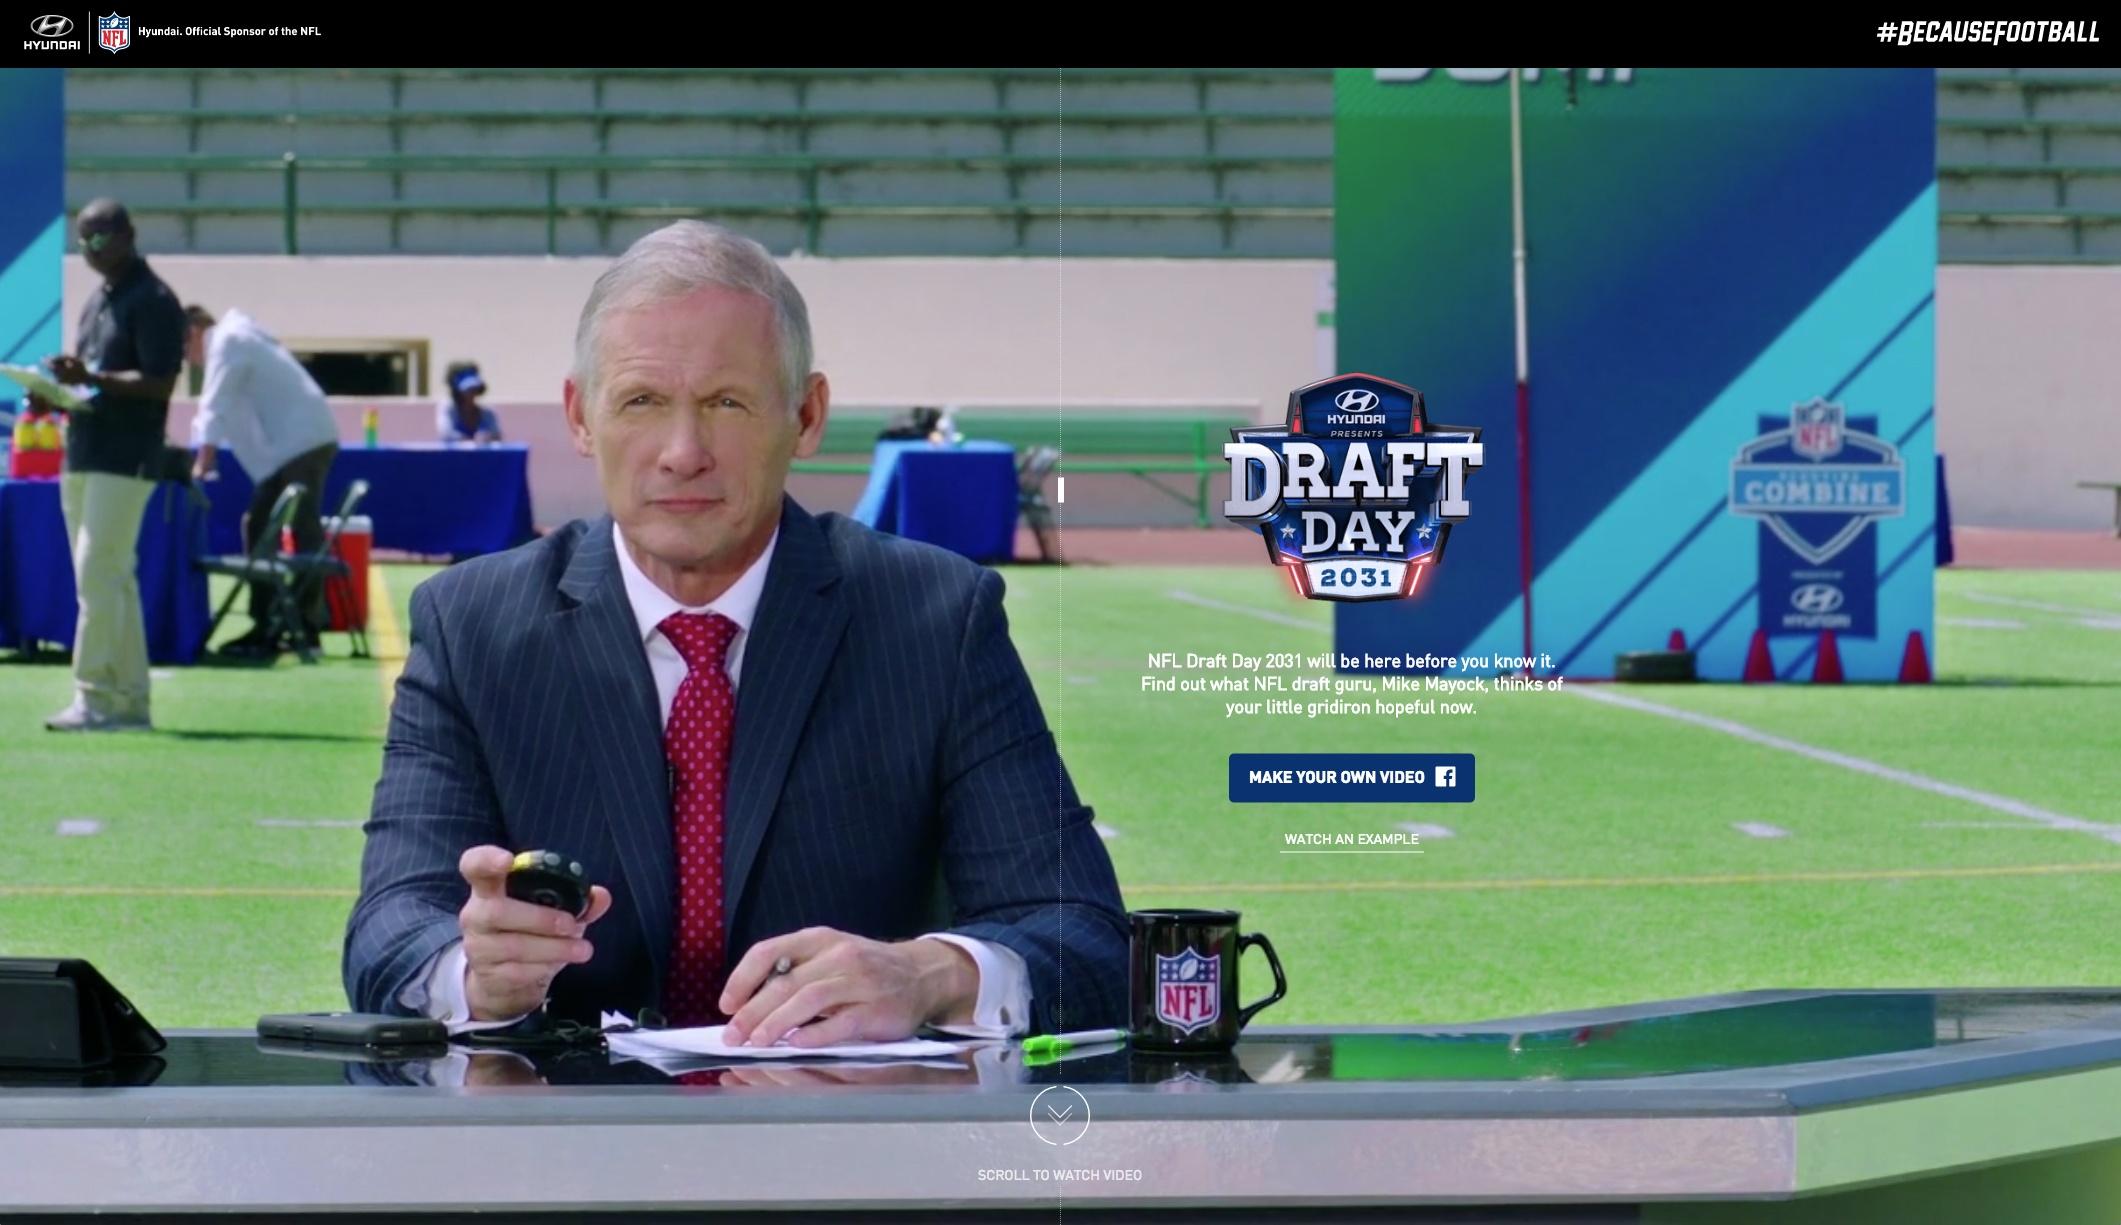 Thumbnail for Draft Day 2031